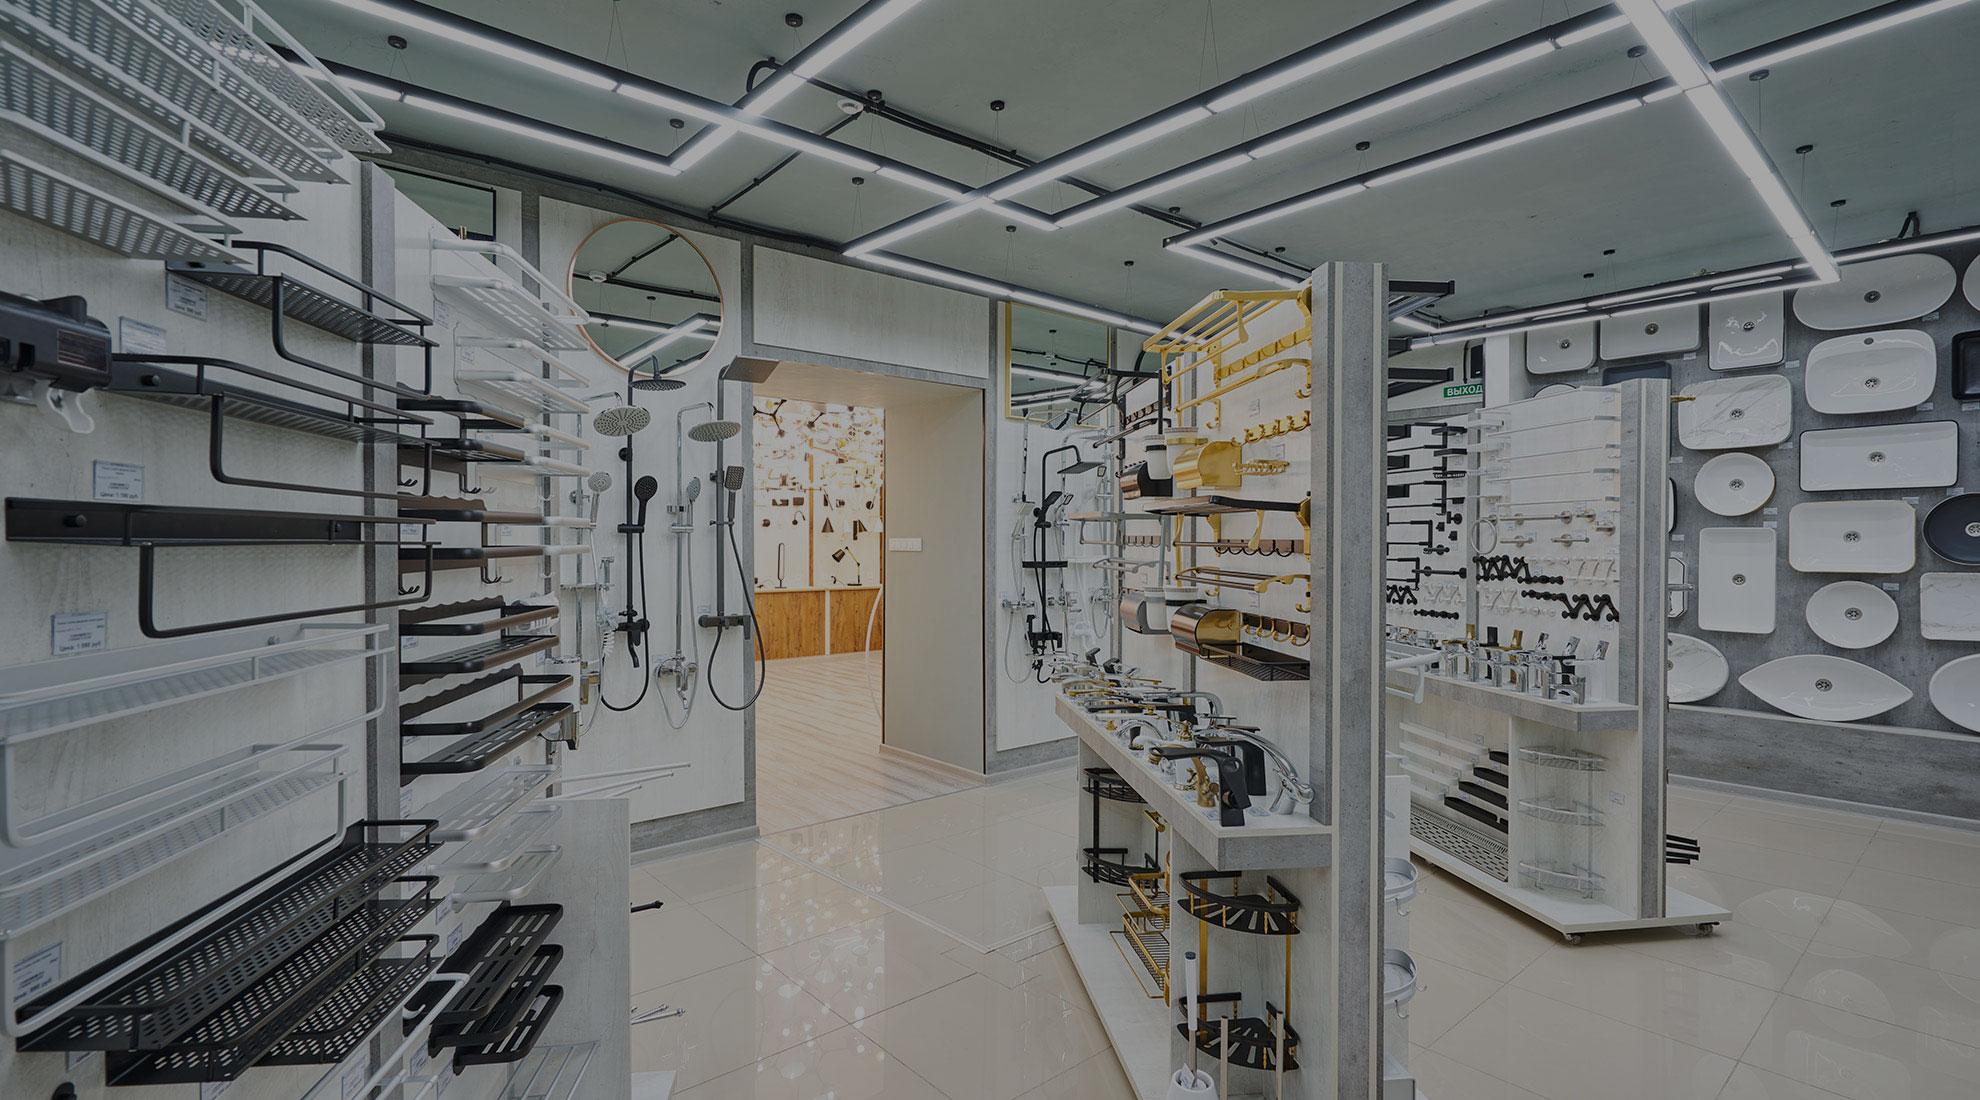 фотография магазина - отдел сантехники